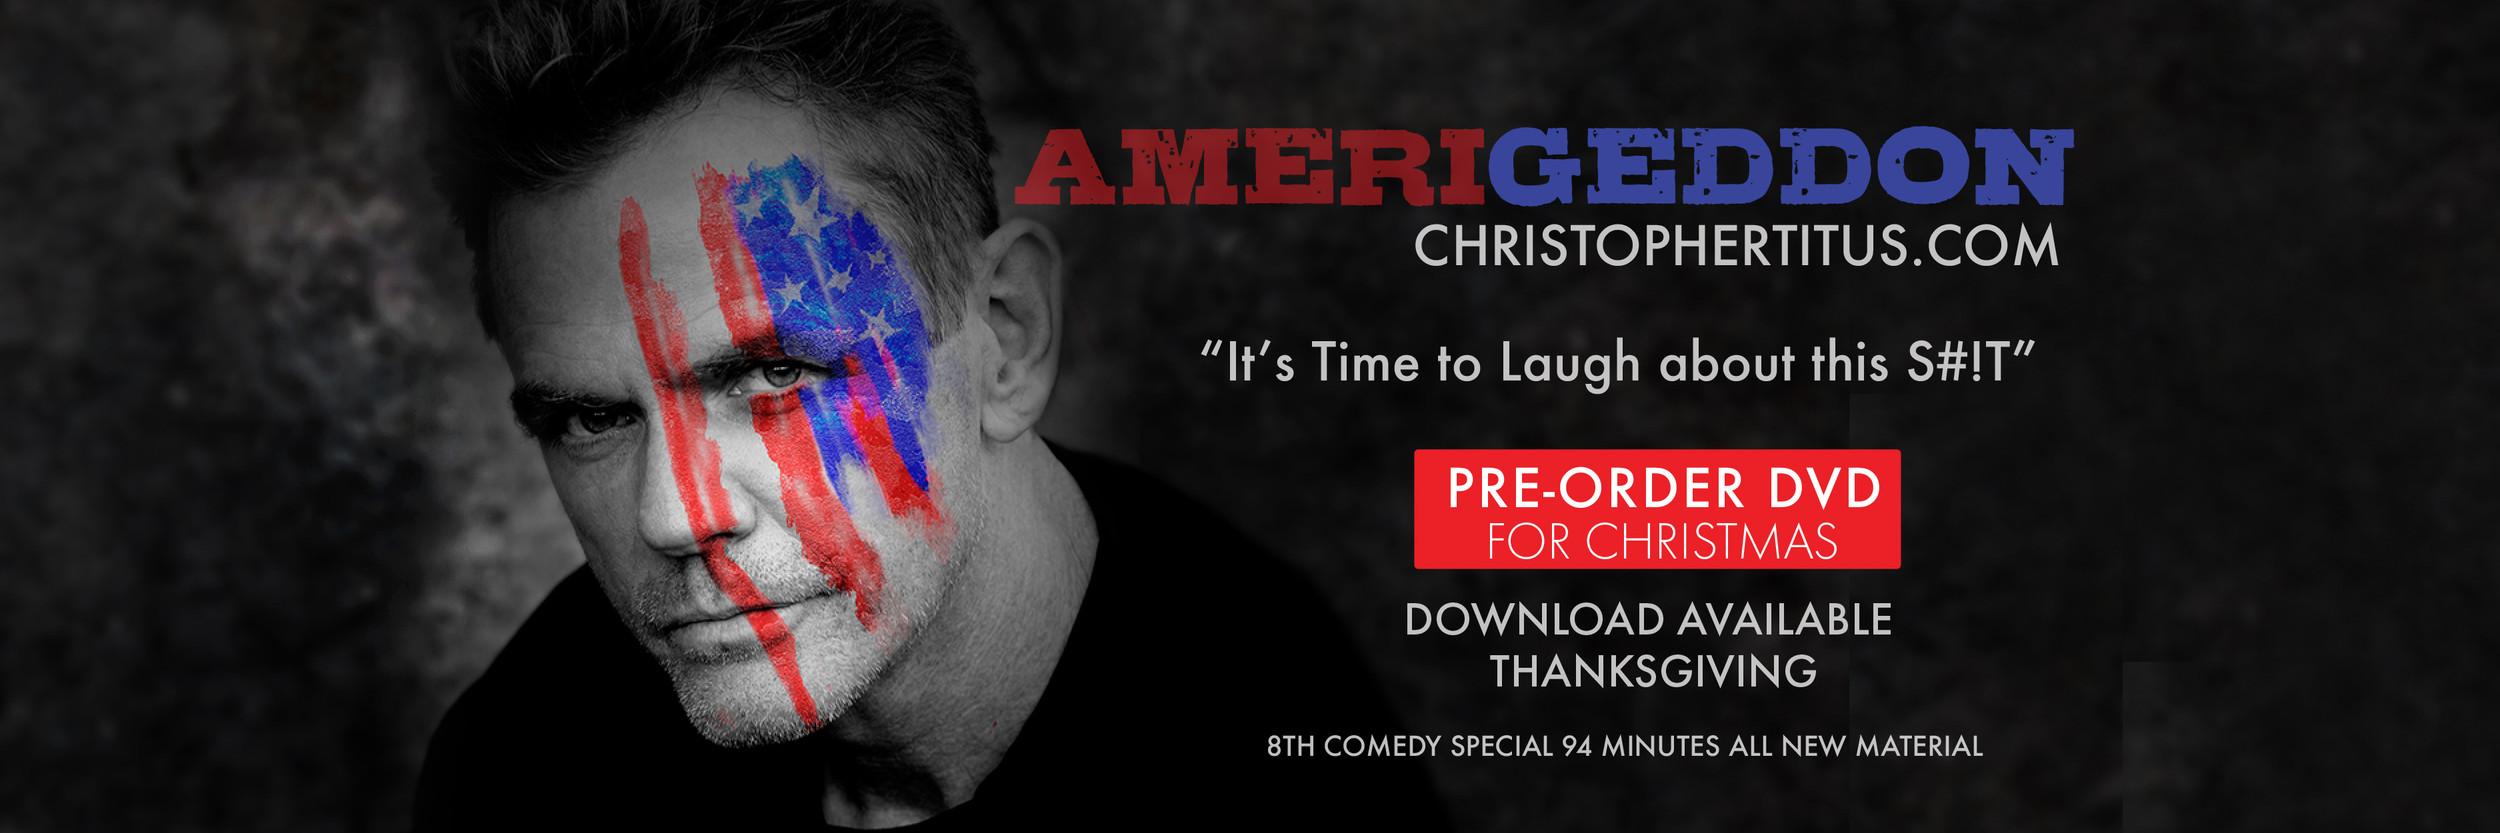 Christopher Titus | Comedian